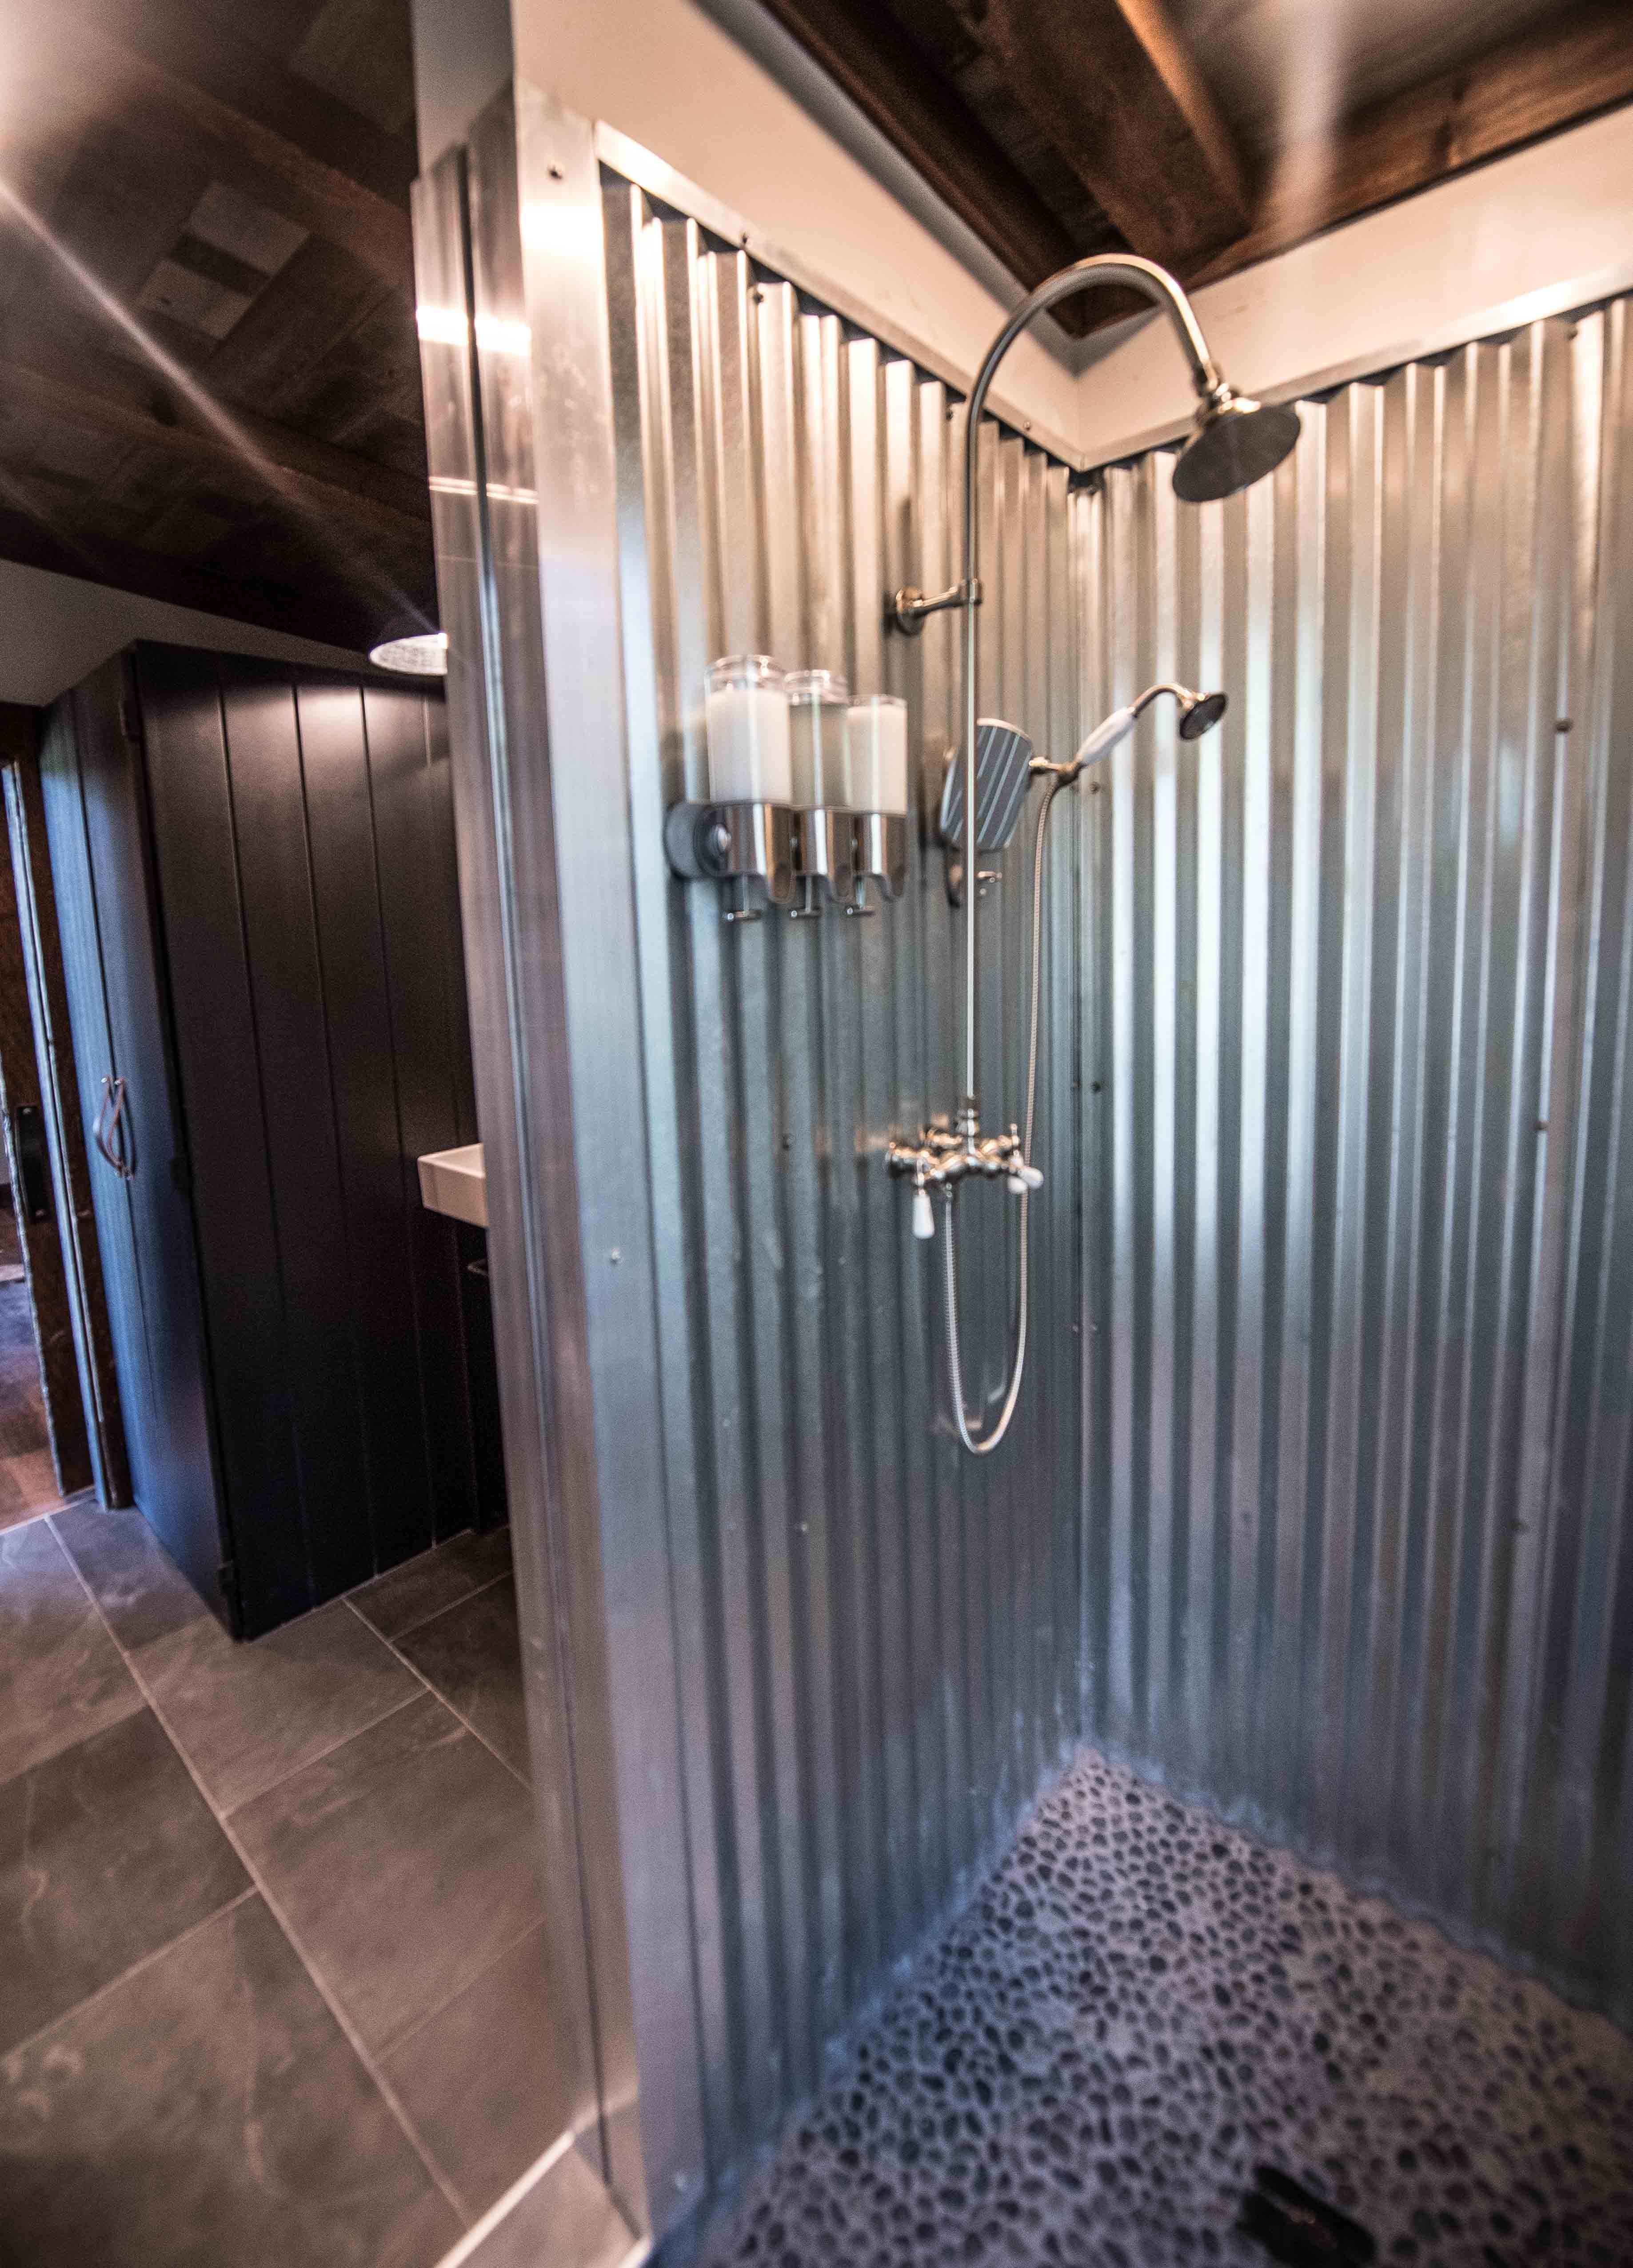 Jump Shack Steel Or Galvanized Metal Shower Nomadic